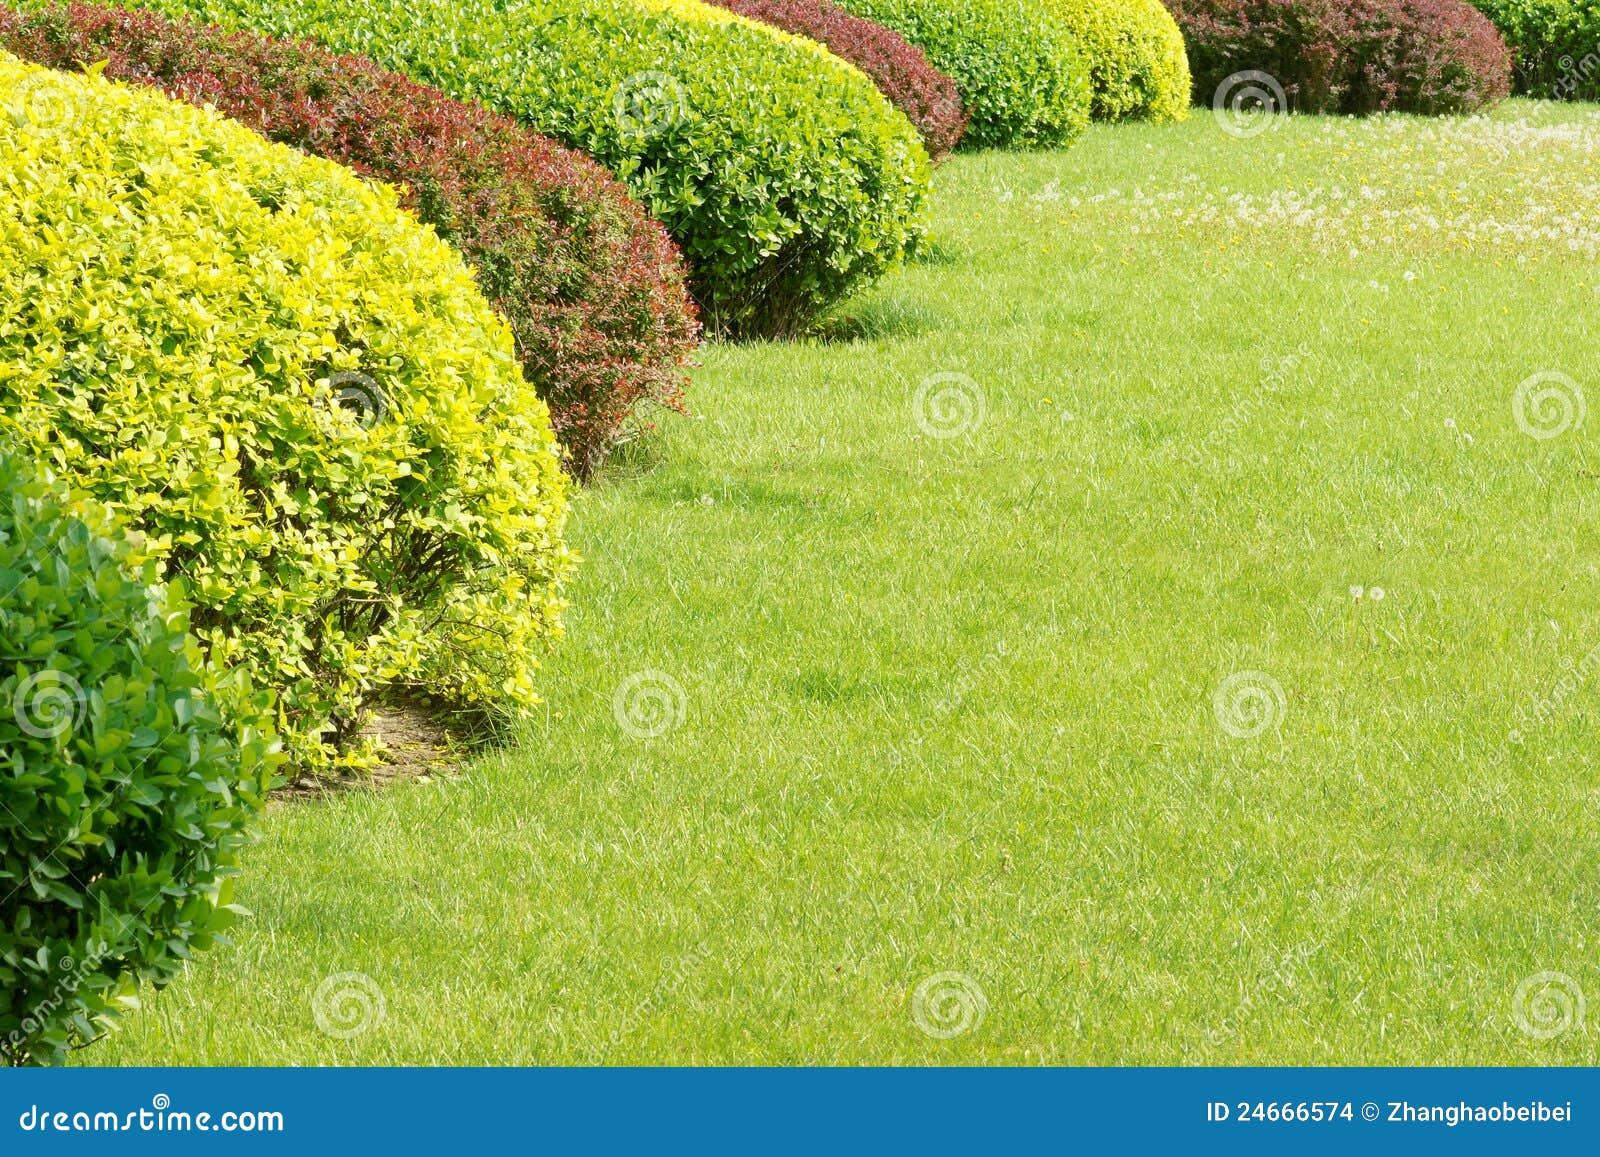 Shrubbery and grassplot